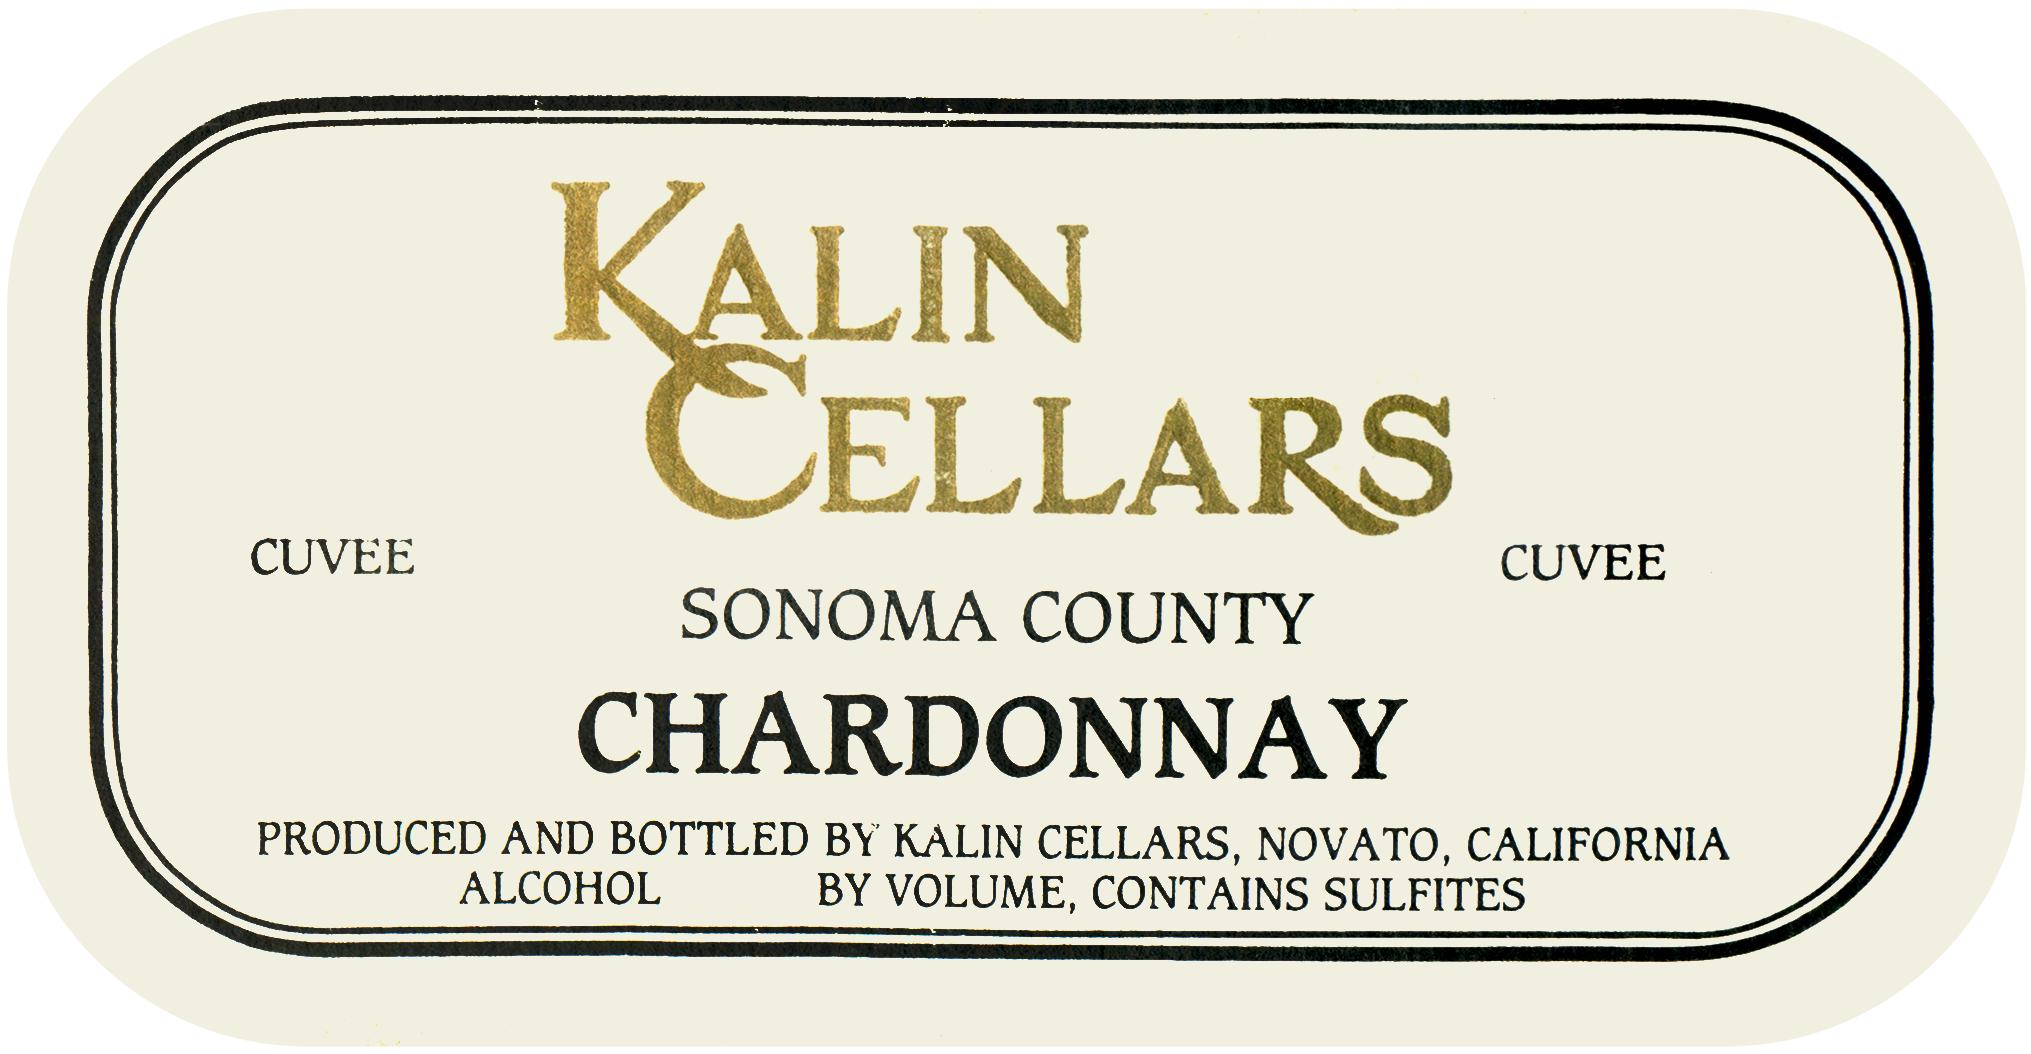 Kalin Cellars Chardonnay Cuvee W Livermore Valley 1996